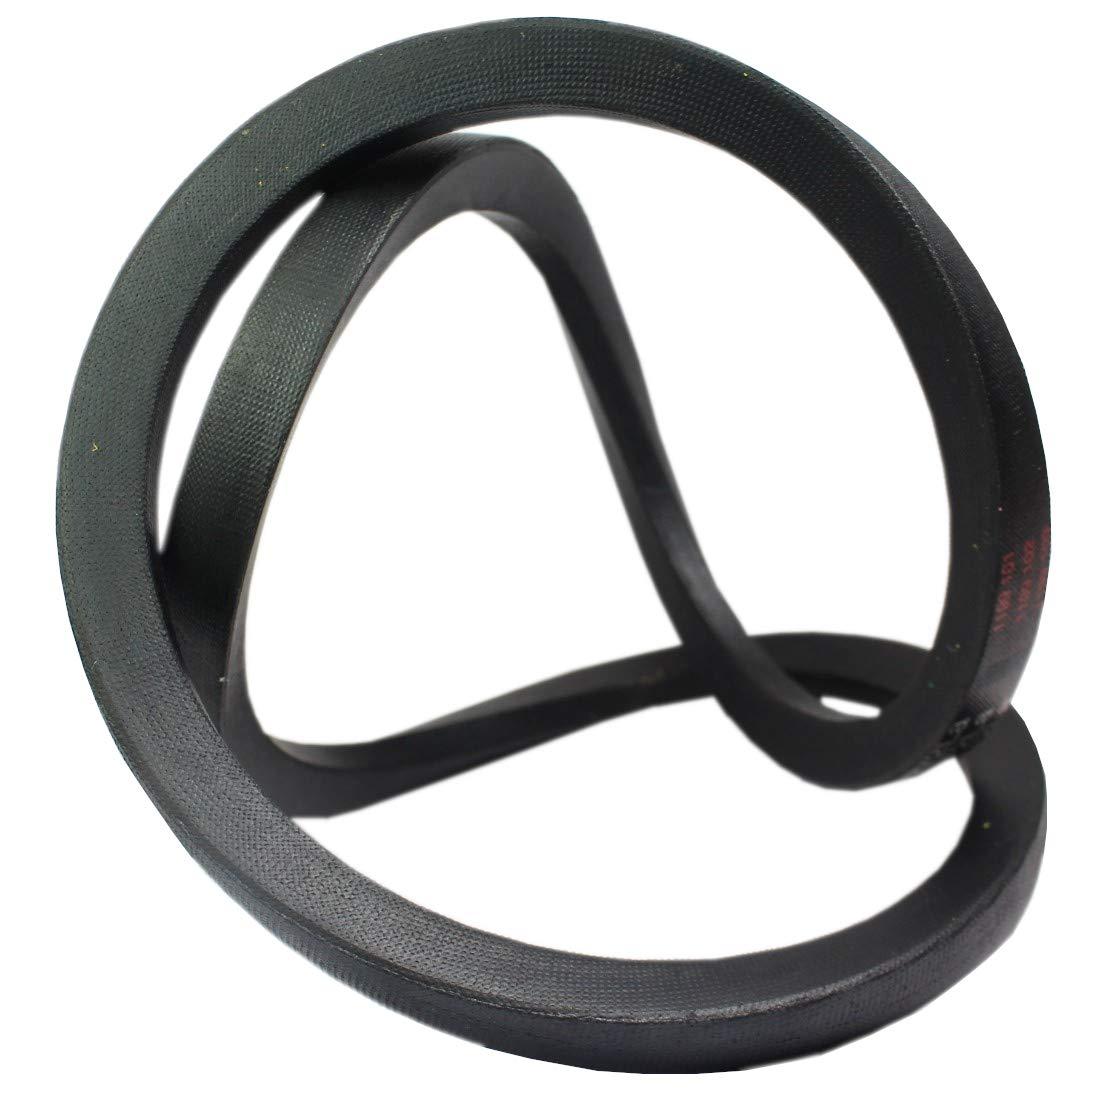 Keilriemen A / 13 x 1275 Li DIN 2215 V-Belt